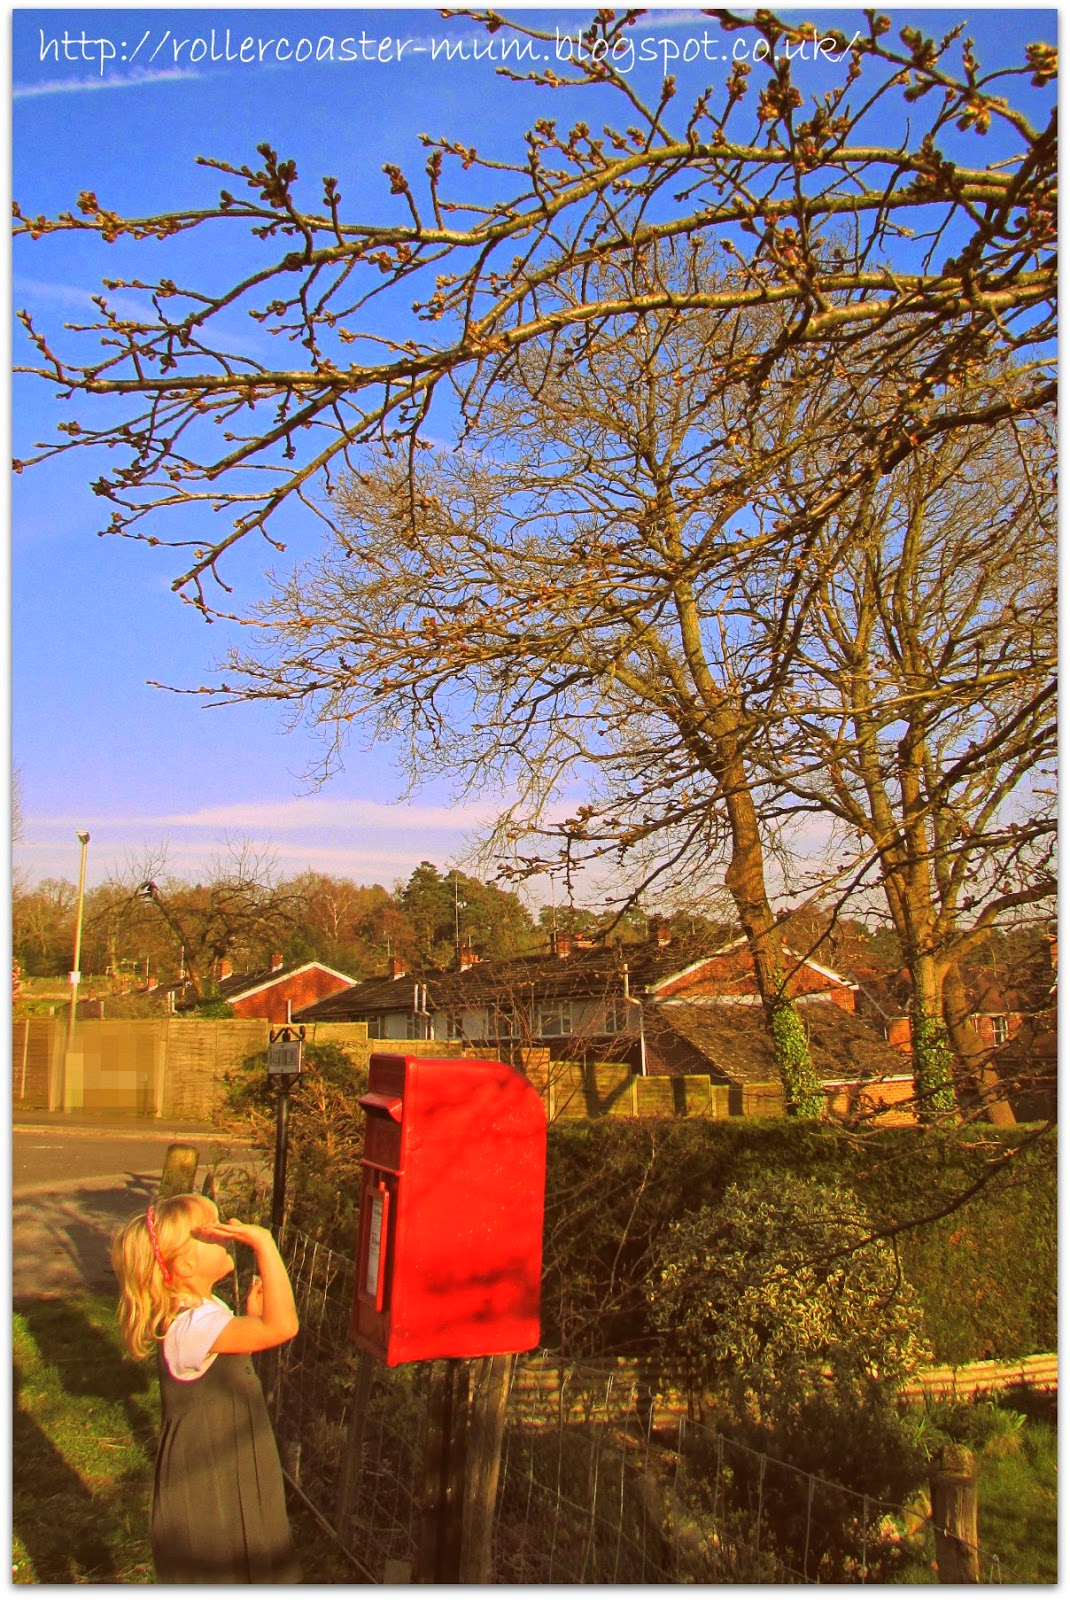 spring sunshine for the school run